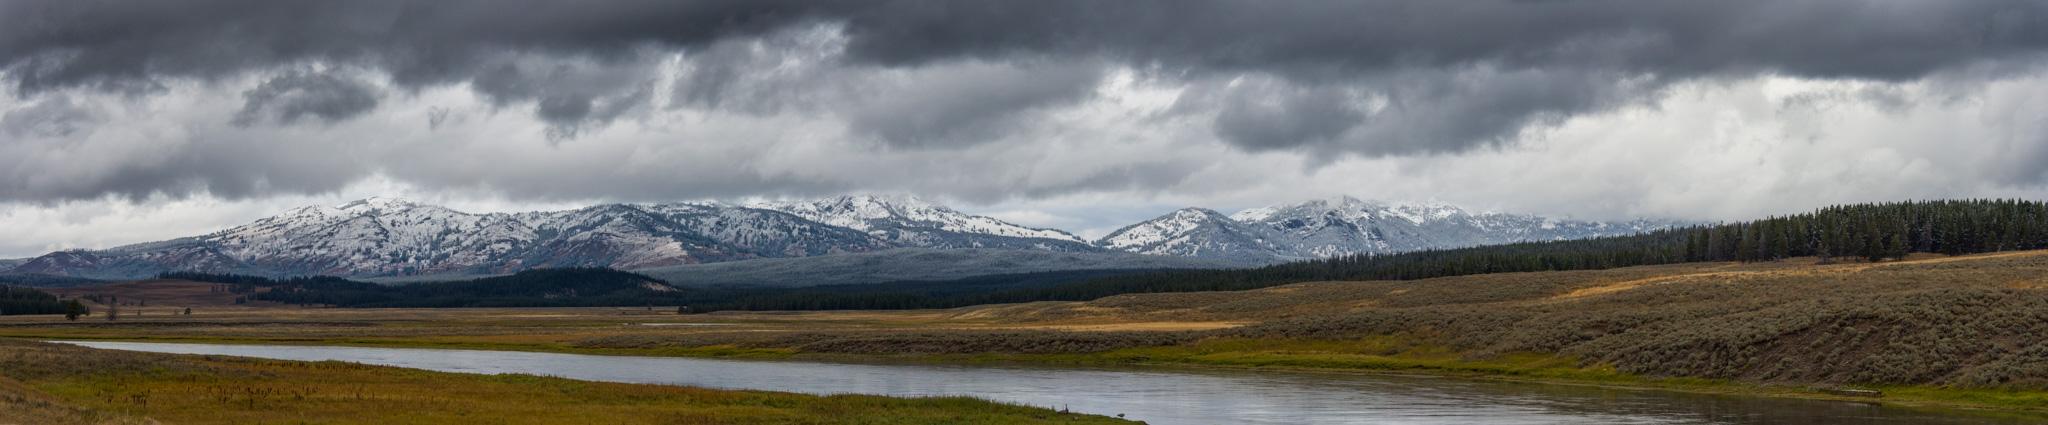 Yellowstone & Grand Tetons National Park